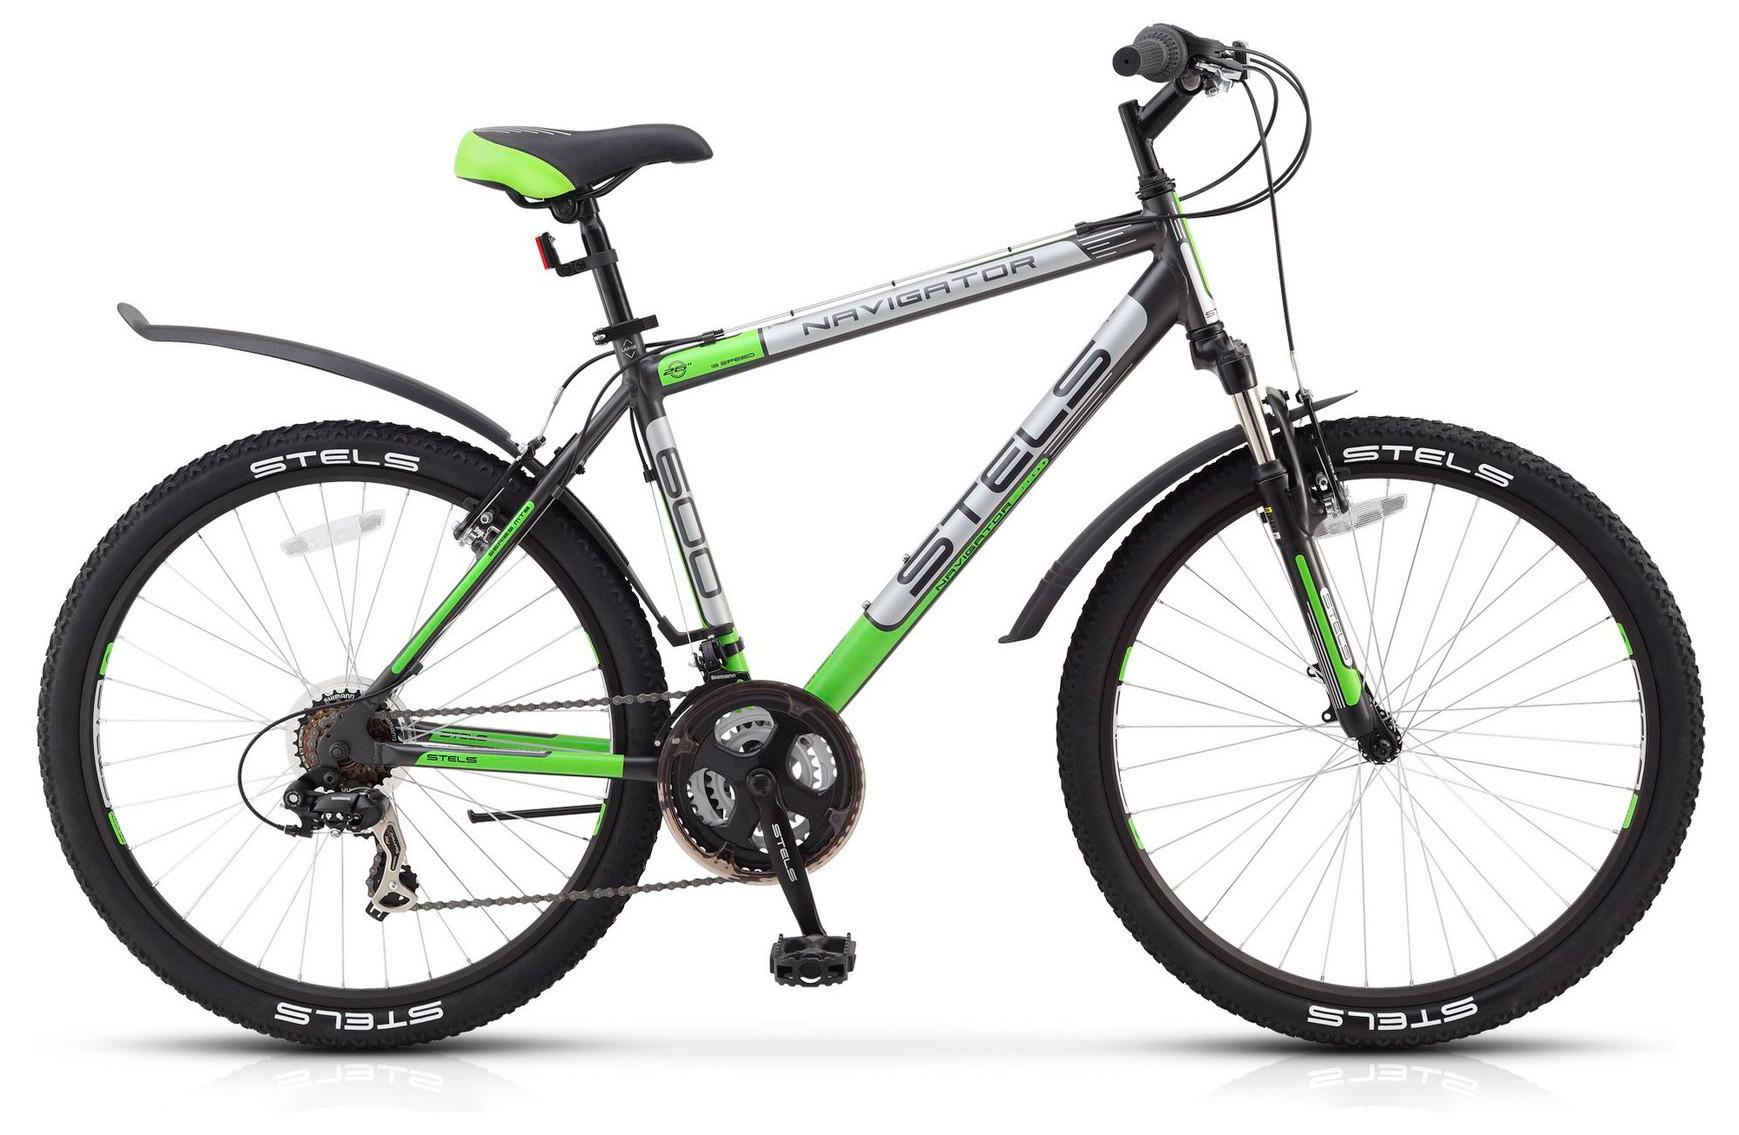 "Горный велосипед Stels Navigator-600V 2017 V030 рама 16"" черный/зеленый"